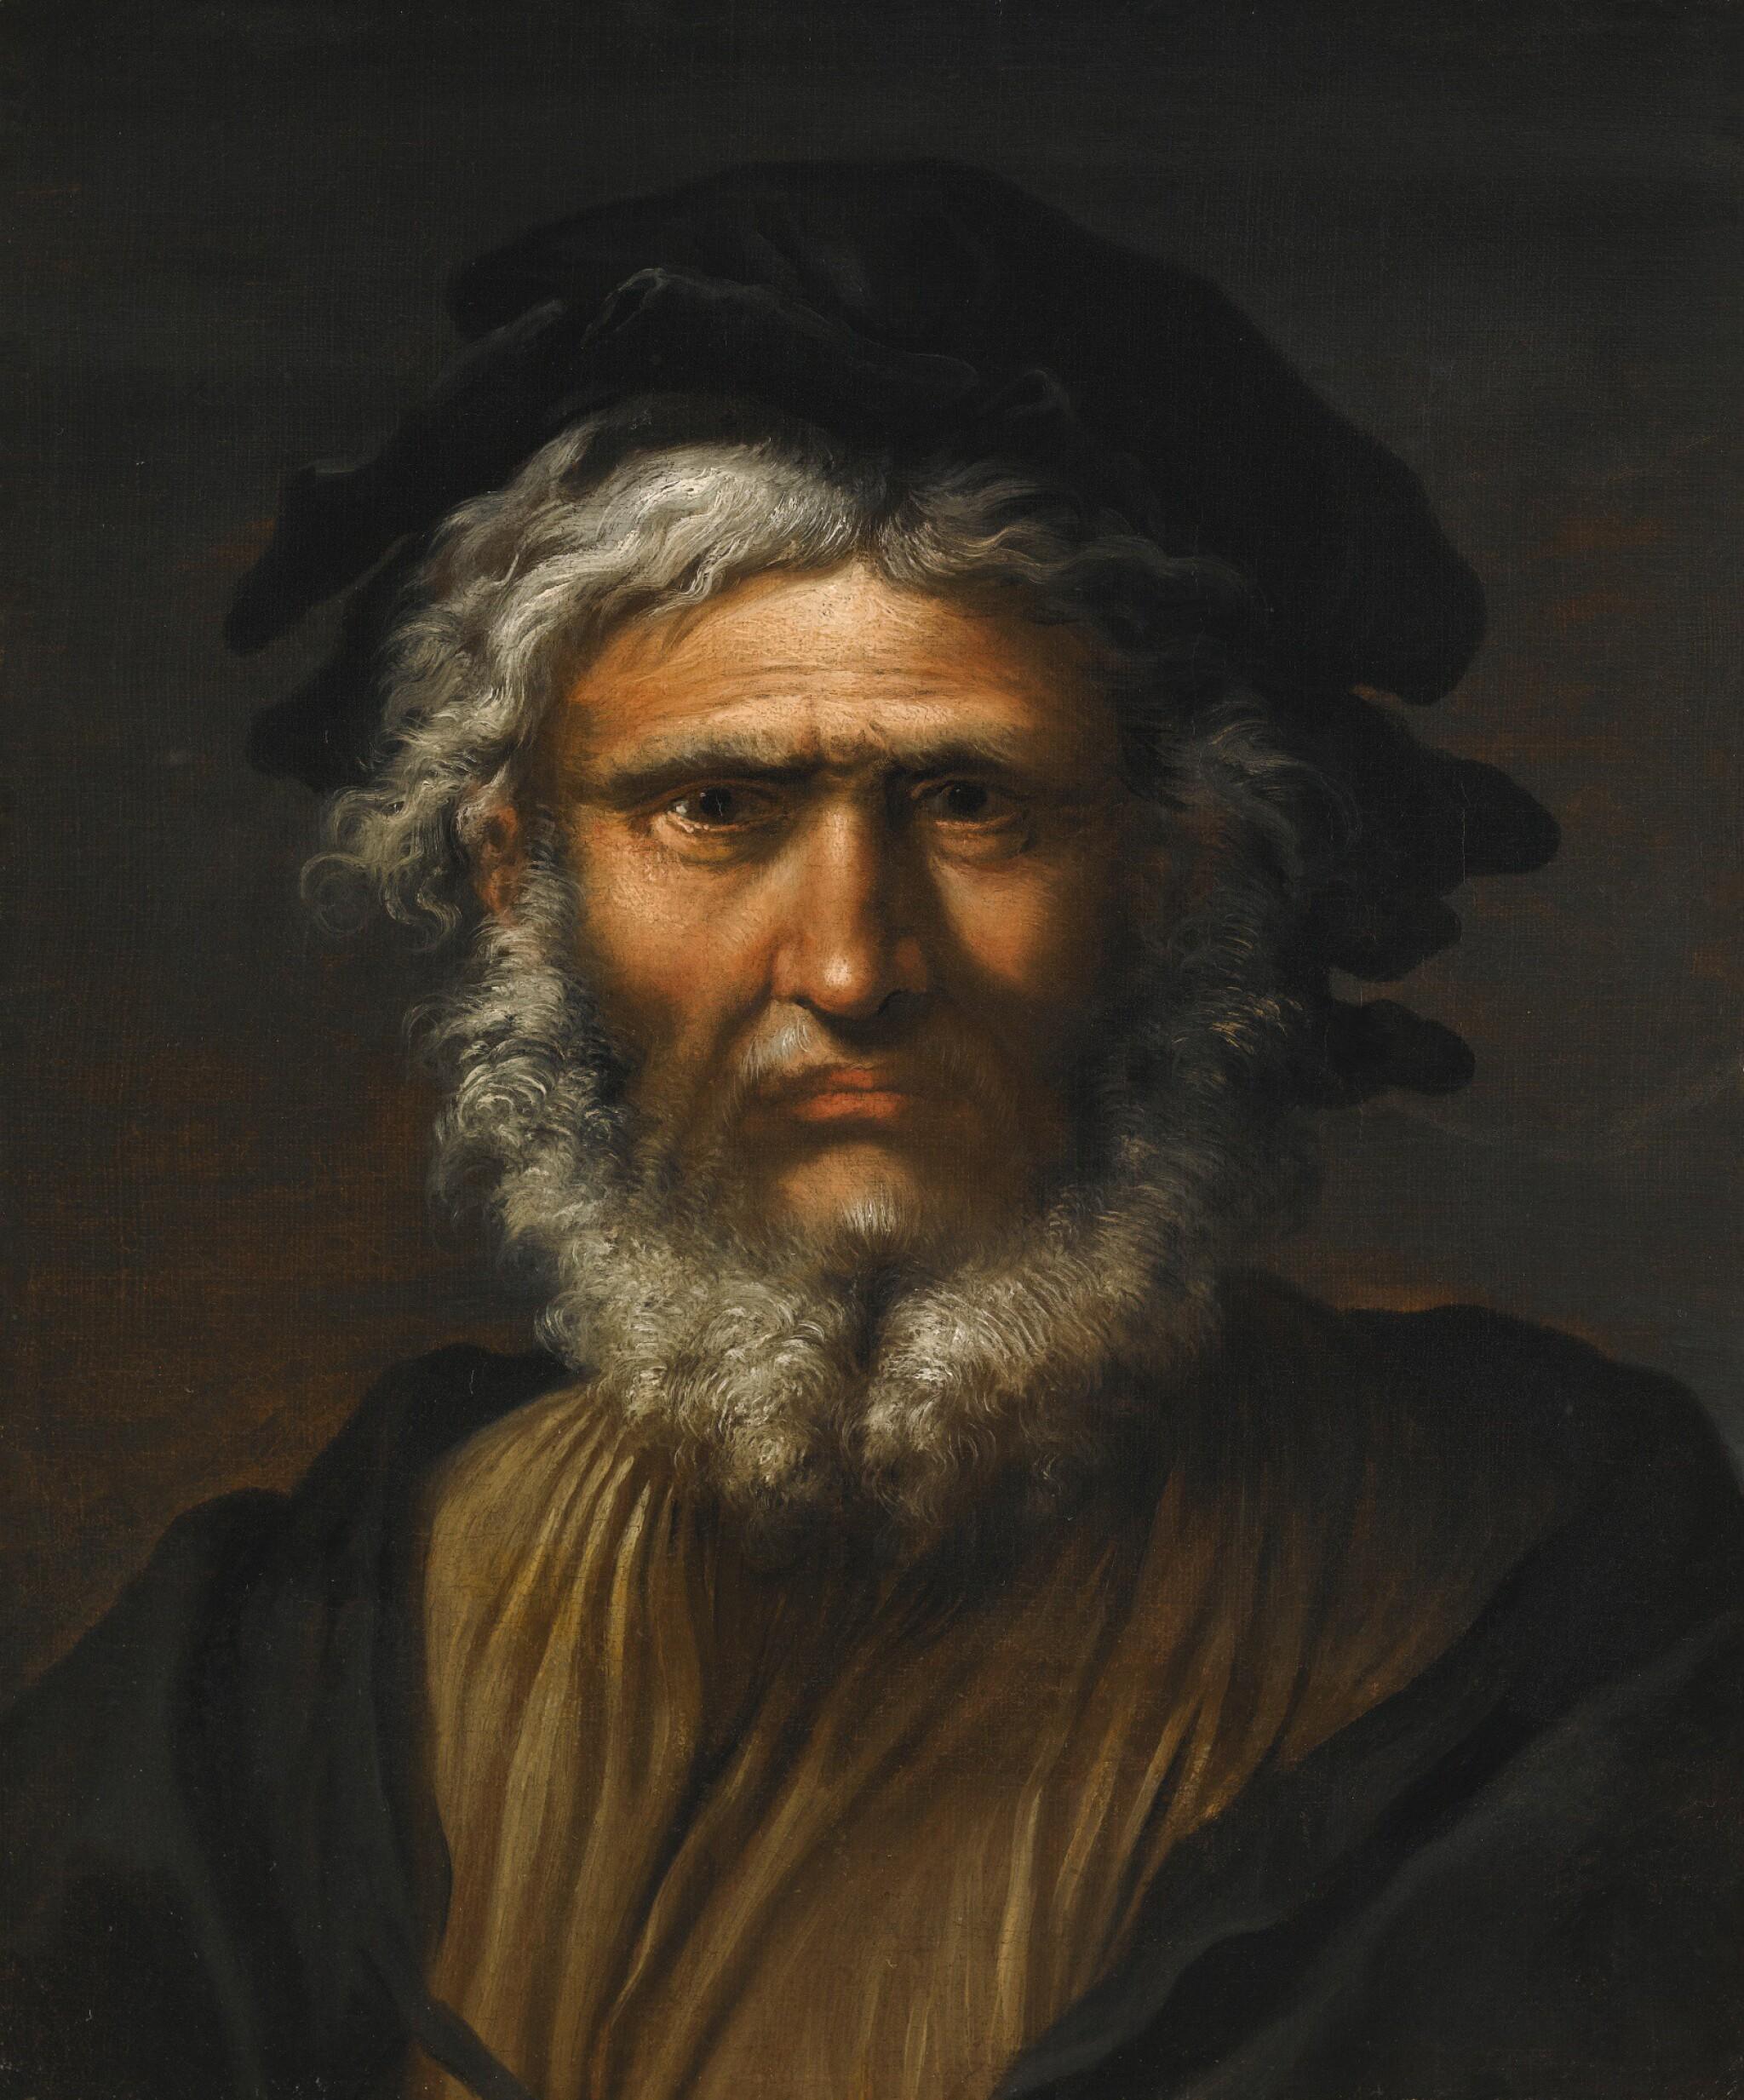 SALVATOR ROSA | Portrait of a bearded man, bust-length, traditionally identified as Masaniello | 薩爾瓦多・洛薩 | 《蓄鬚男子半身像,傳統上被視為馬薩涅洛》